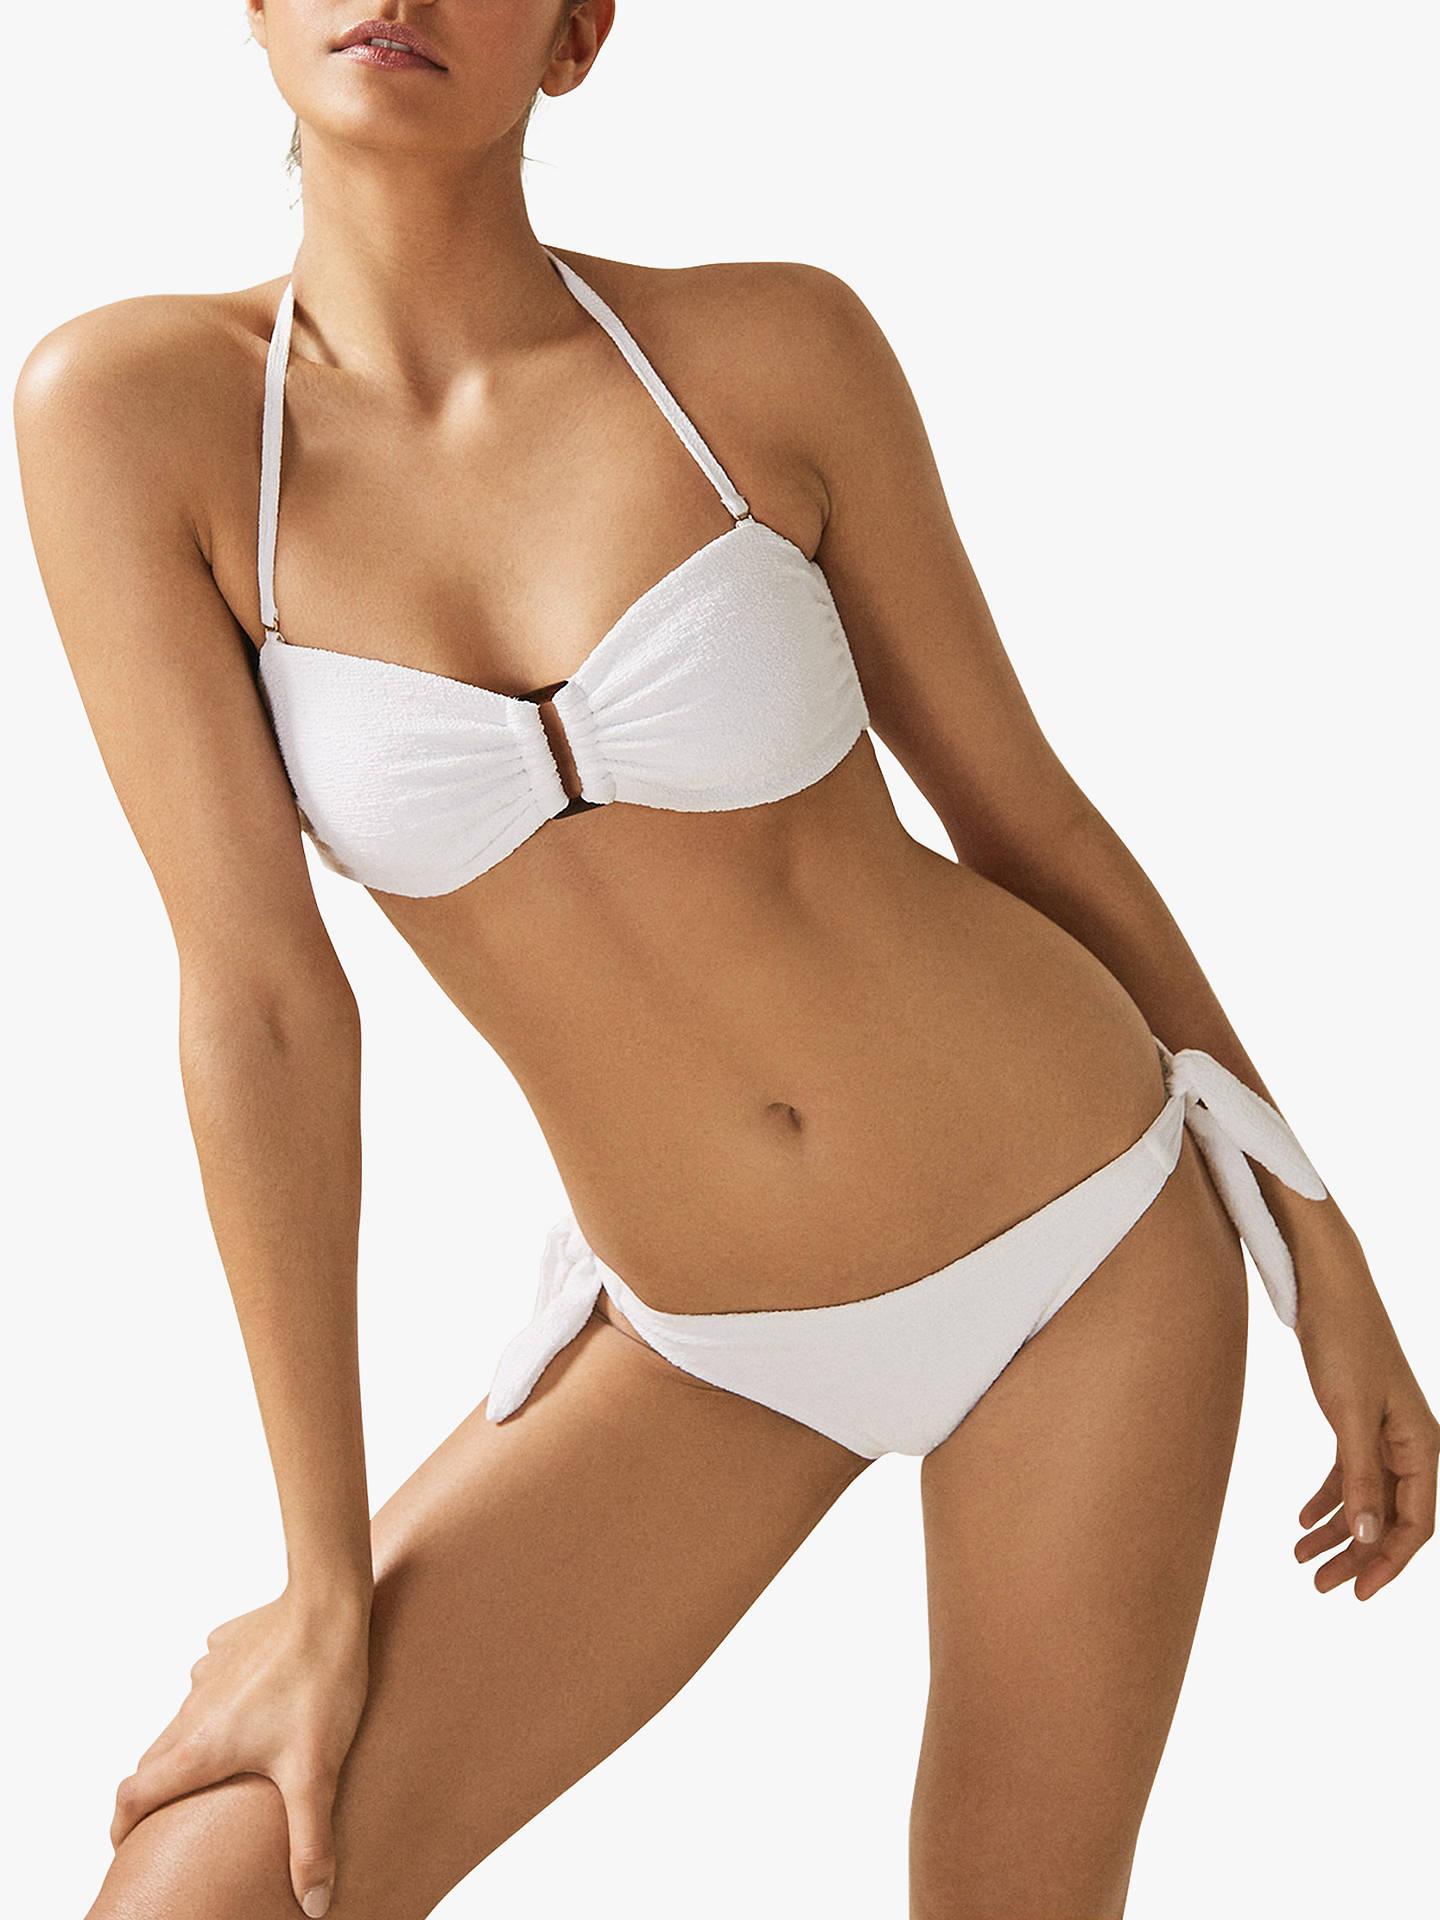 30d55dd4f8 Buy Reiss Florentina Textured Bikini Top, White, XS Online at johnlewis.com  ...